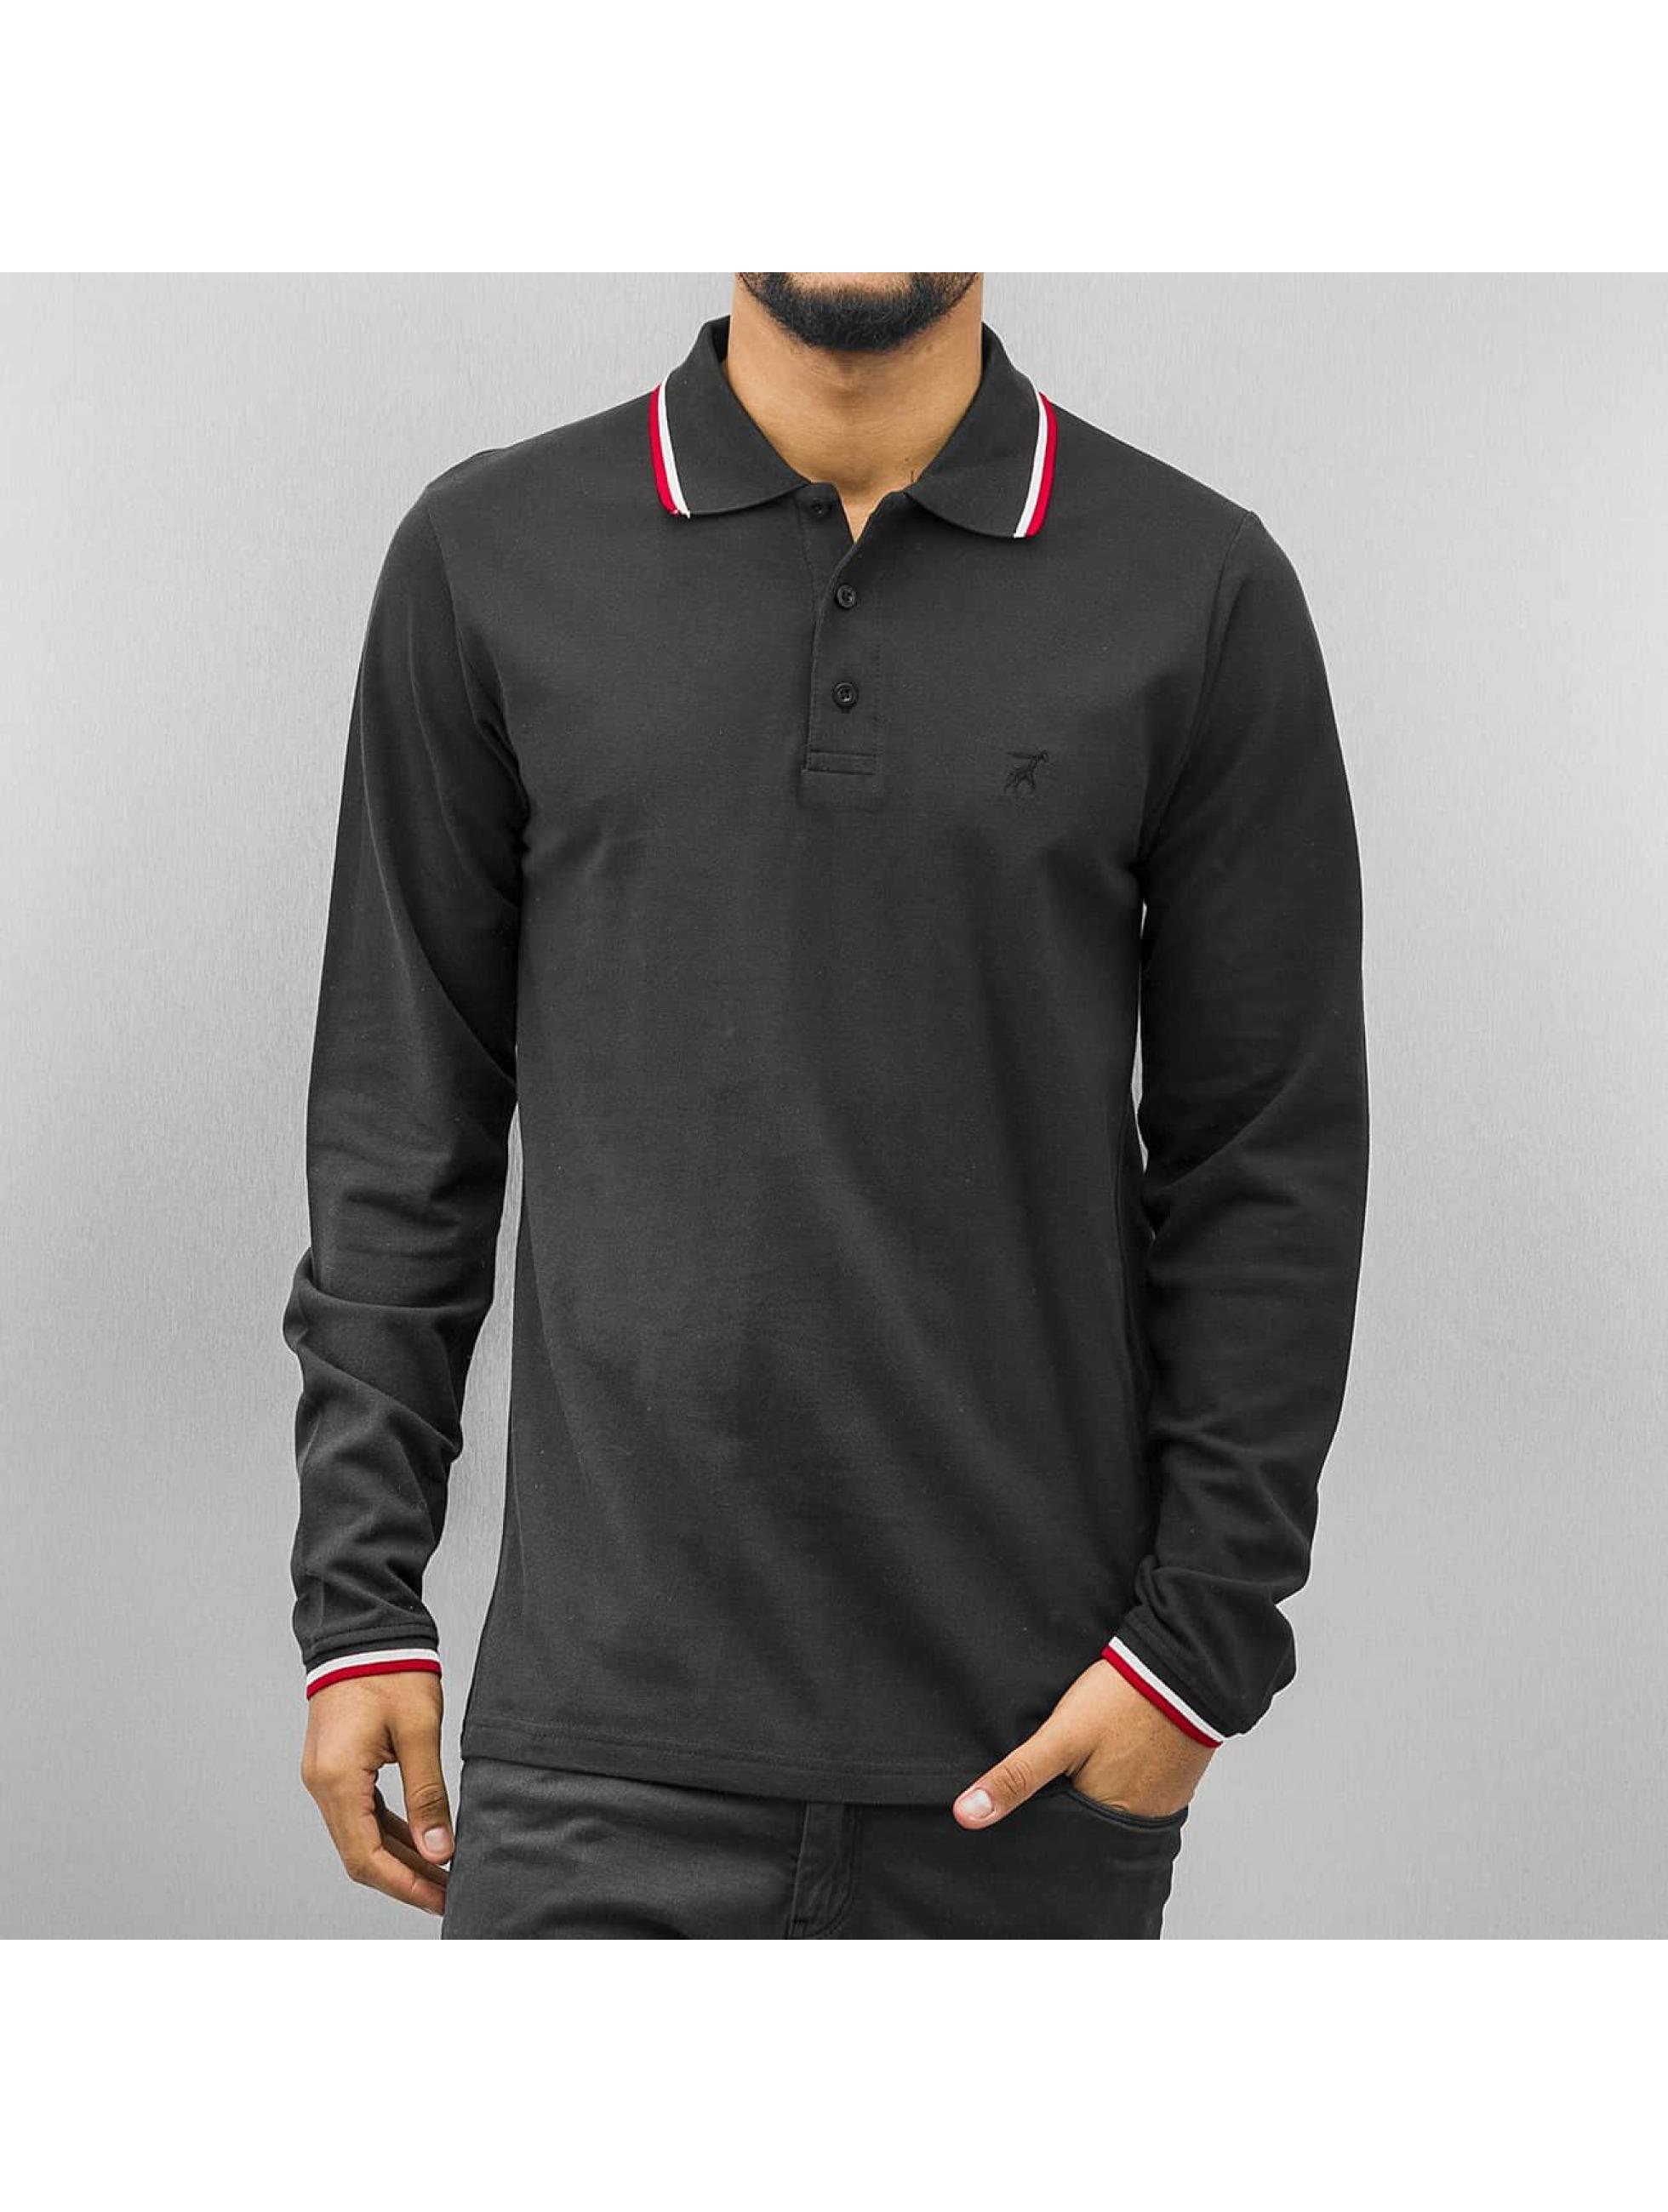 Cazzy Clang Poloshirt Linz schwarz